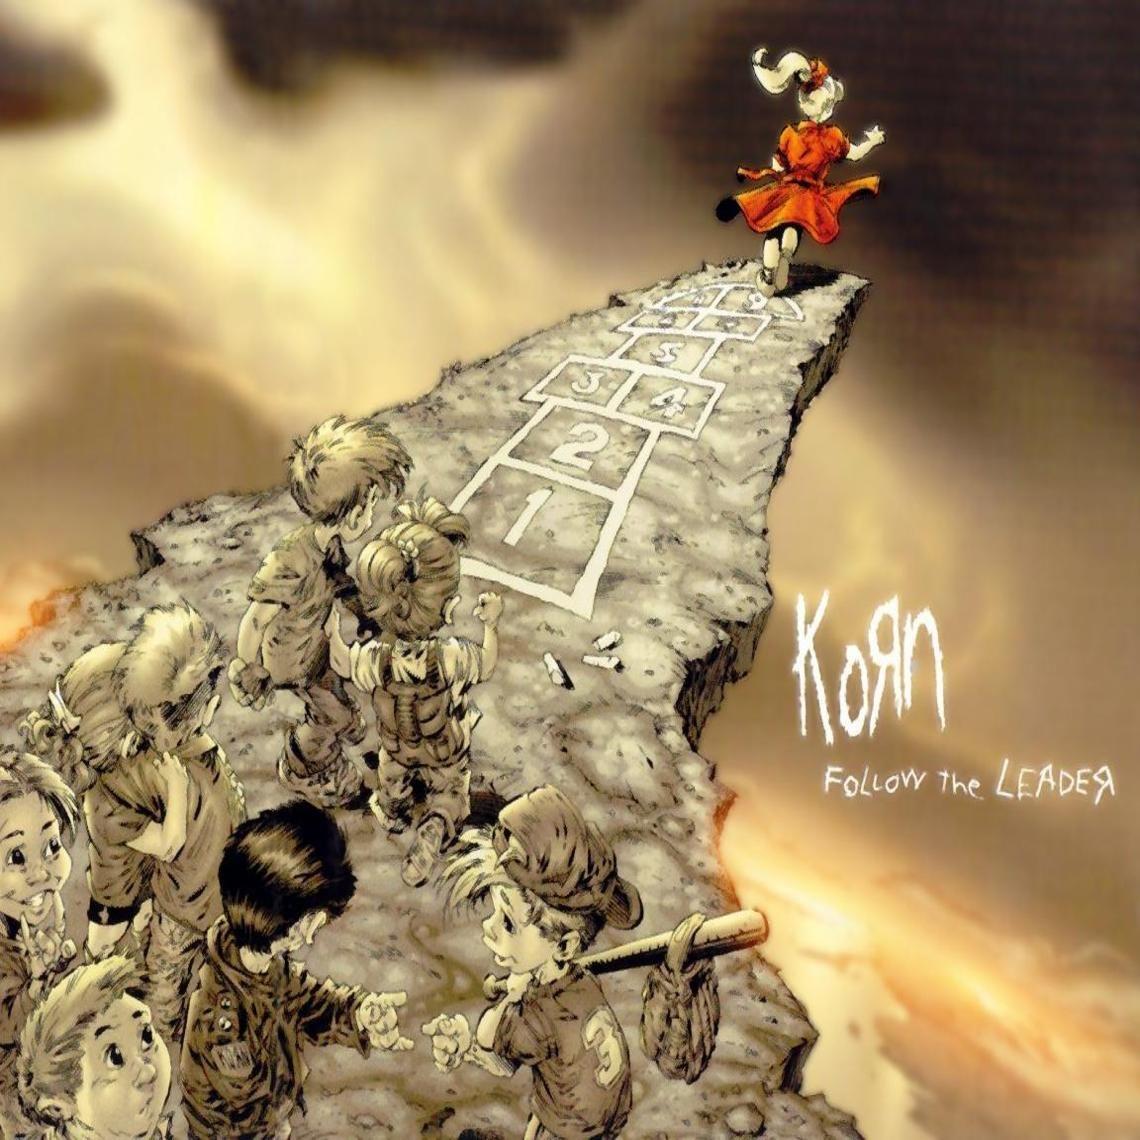 Korn follow the leader album covers in 2019 album covers korn album - Follow wallpaper ...